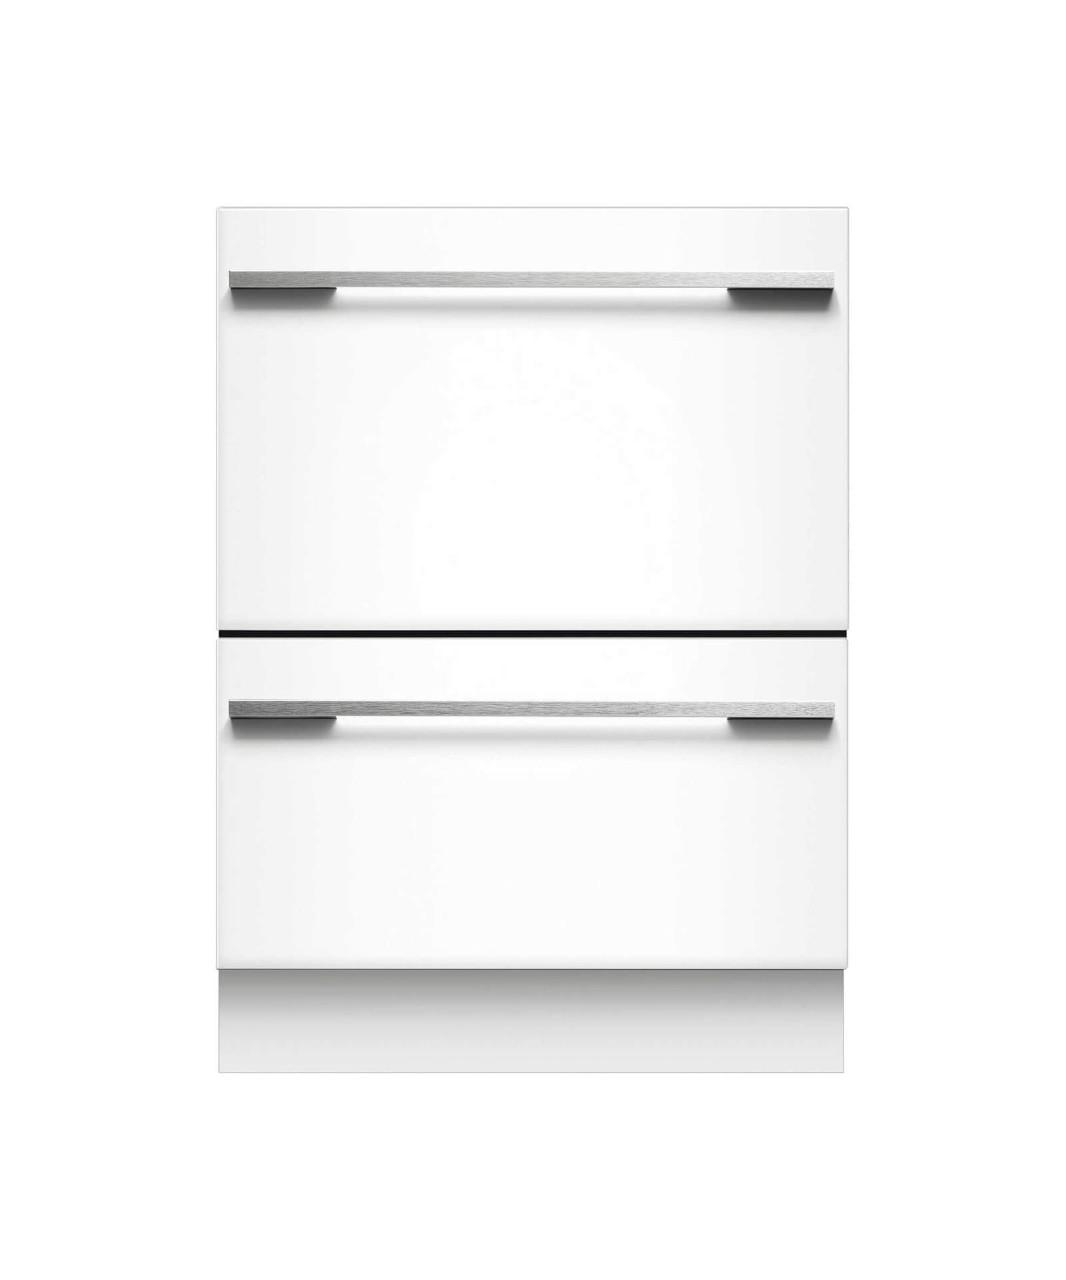 Panel Ready Double DishDrawer dishwasher incl full flex racking